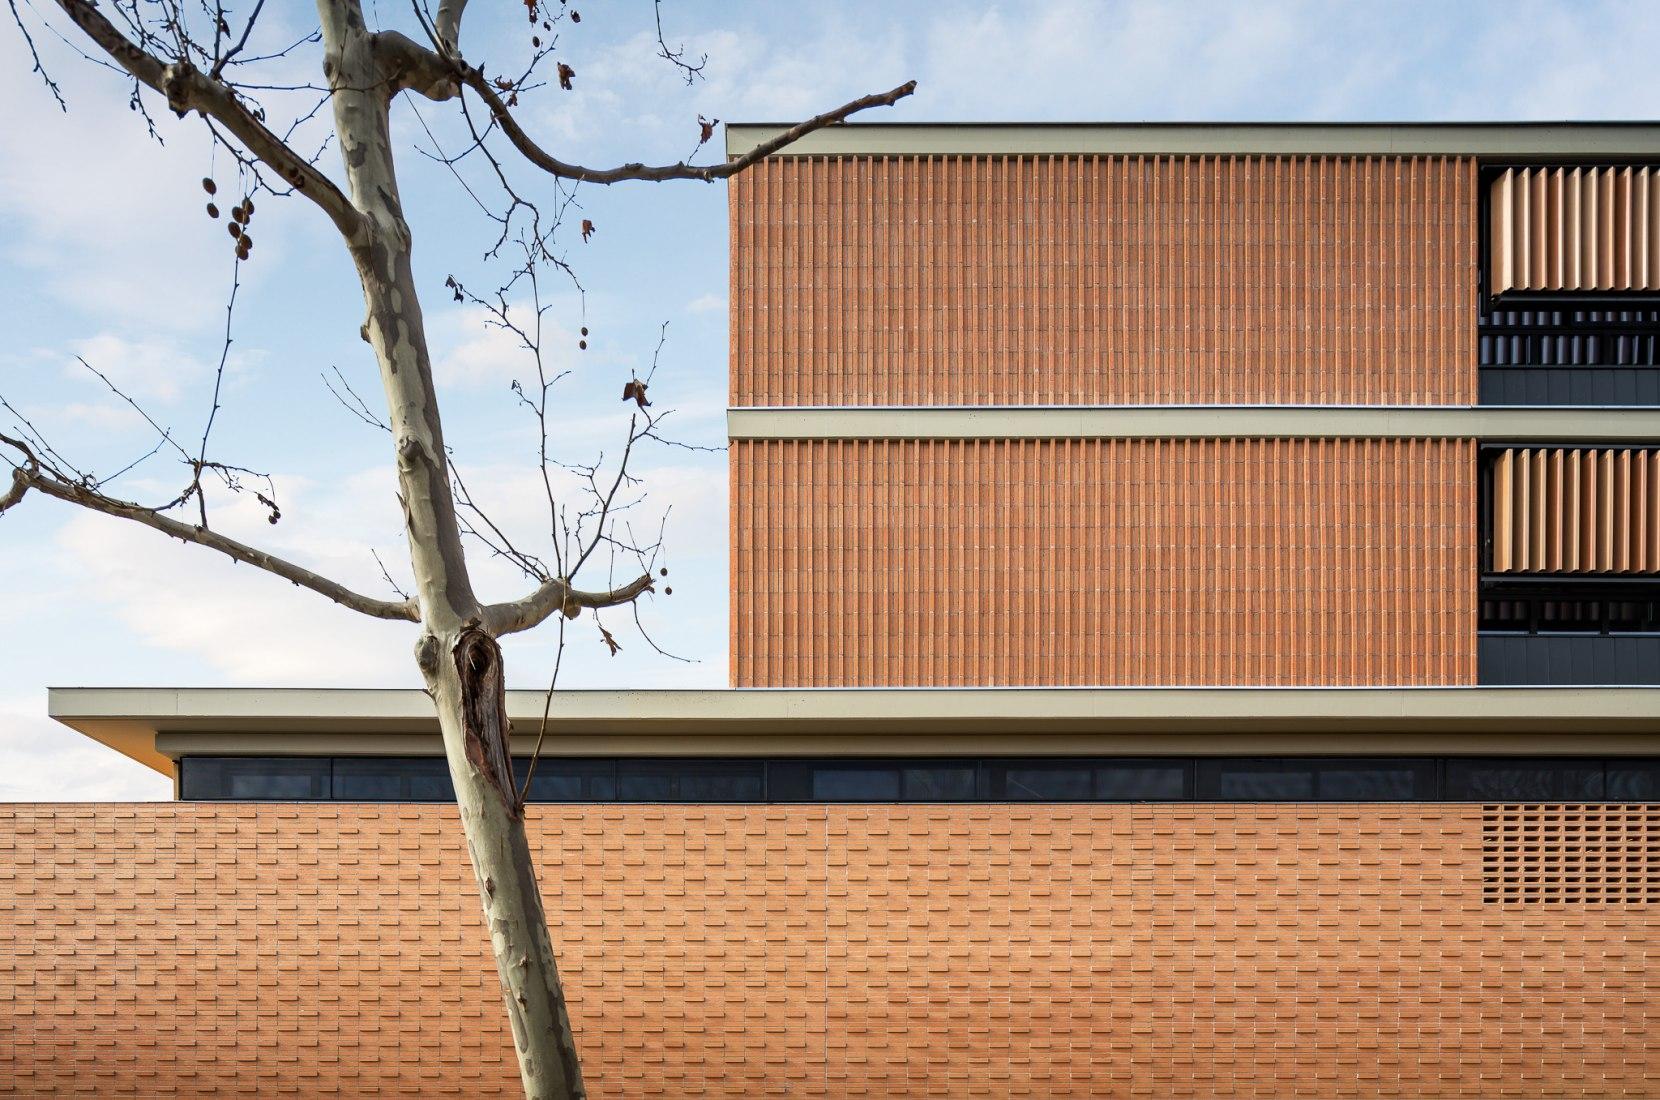 Les Aimerigues Institute by Barceló Balanzó Arquitectes + Xavier Gracia. Photograph by Simón García